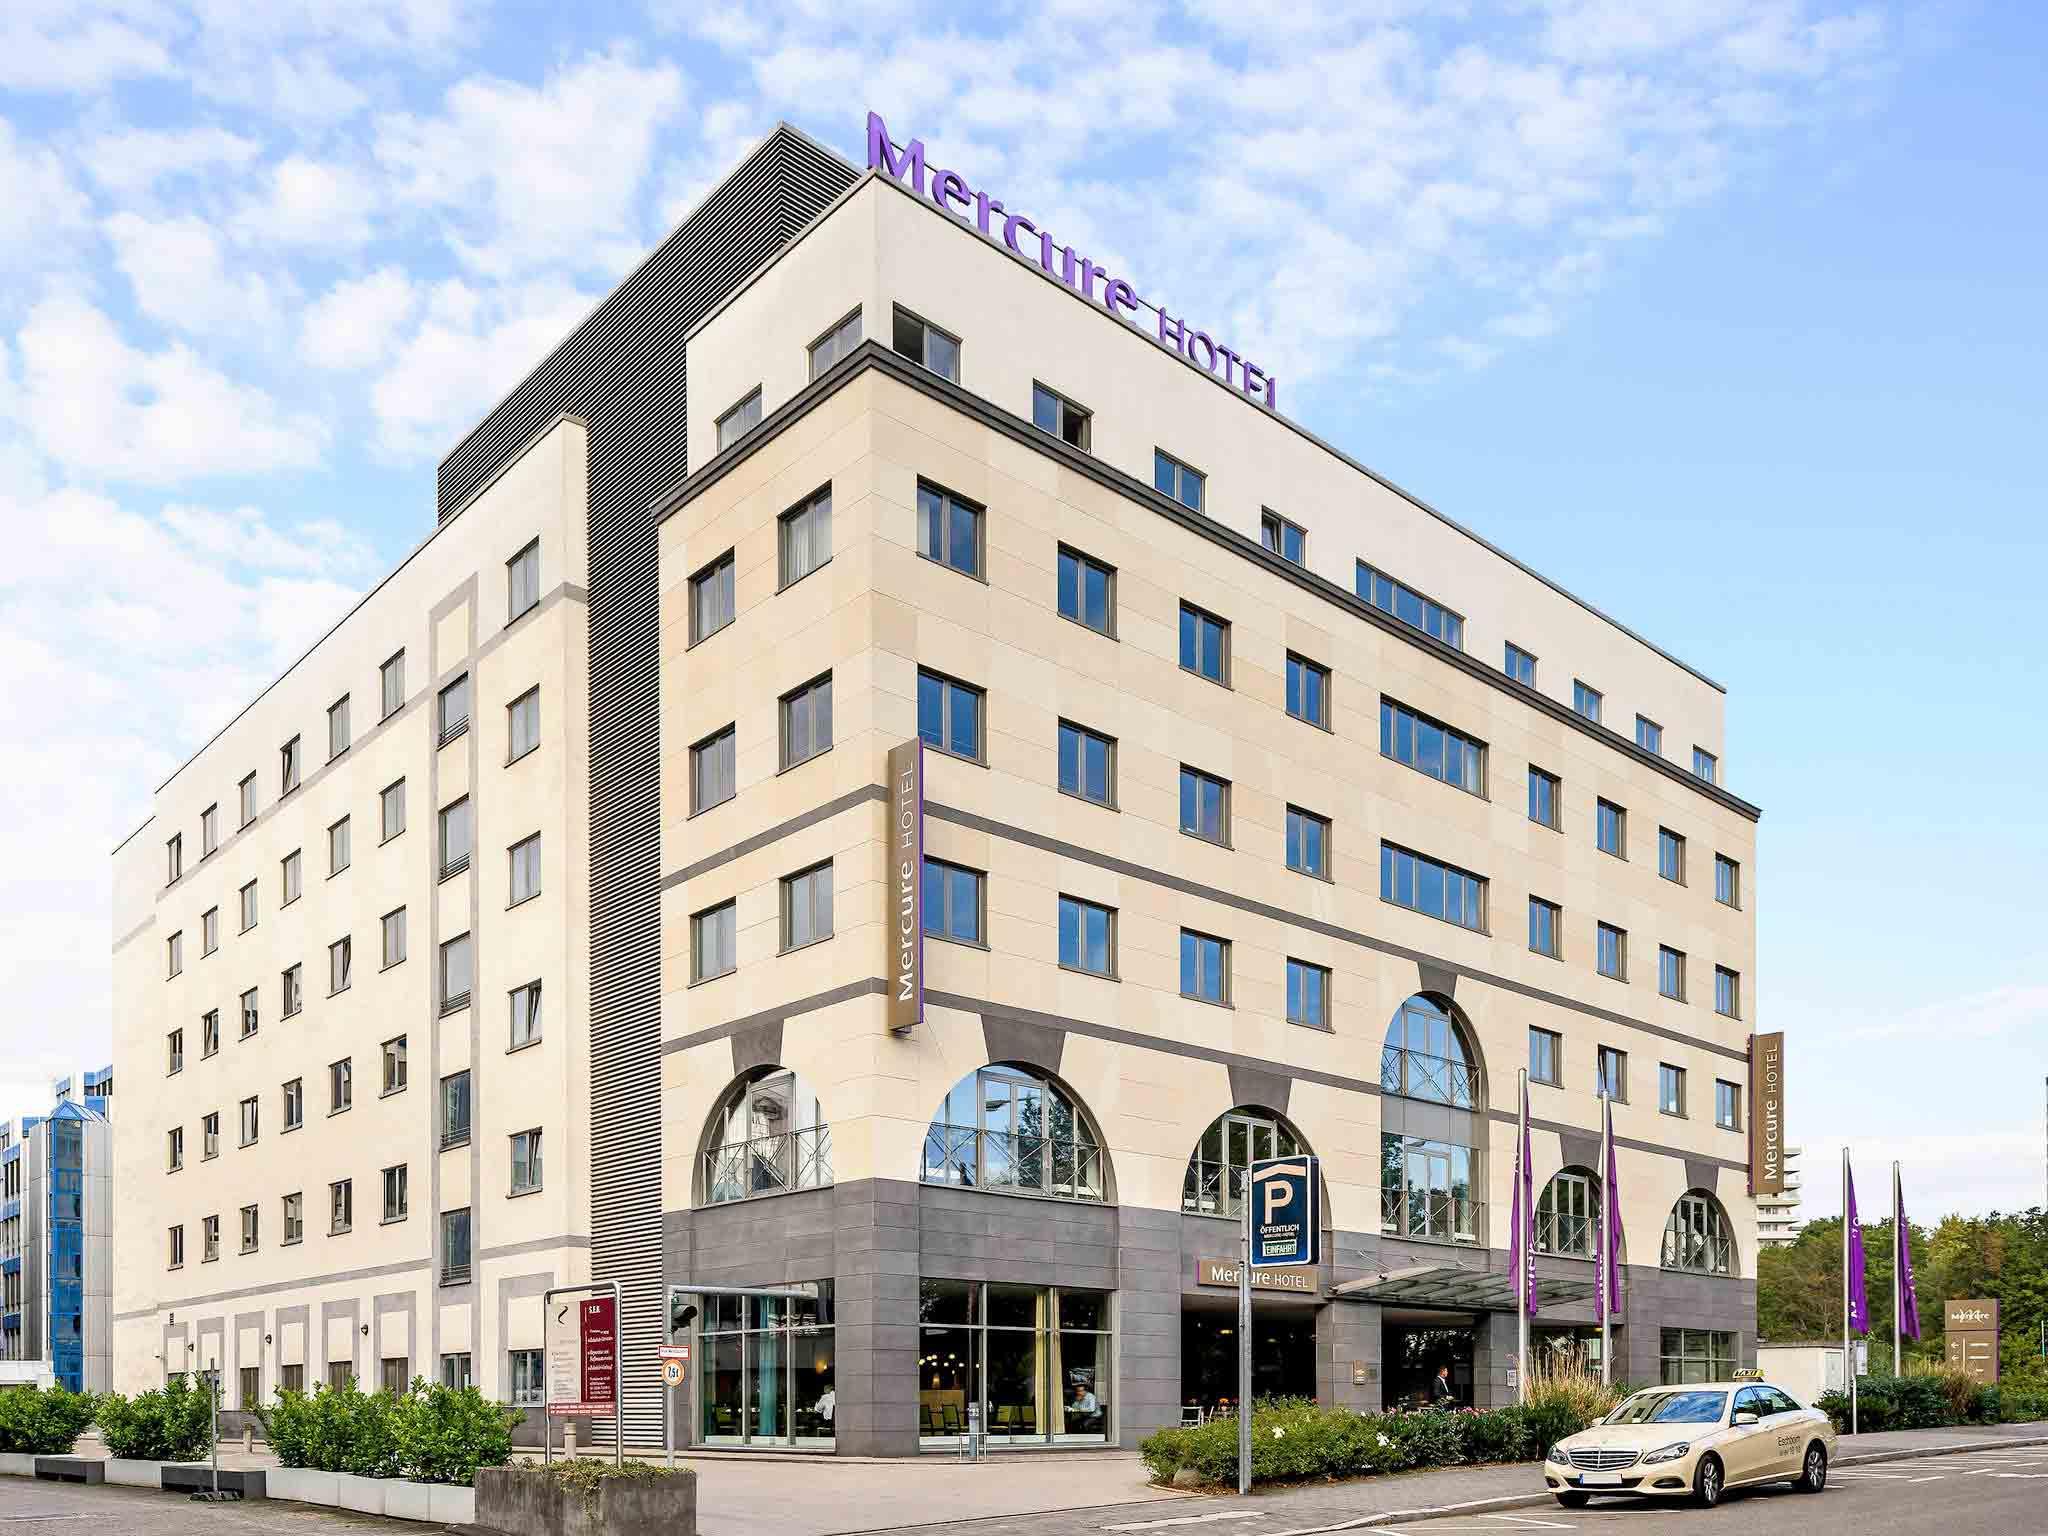 فندق - فندق مركيور Mercure فرانكفورت إشبورن سود